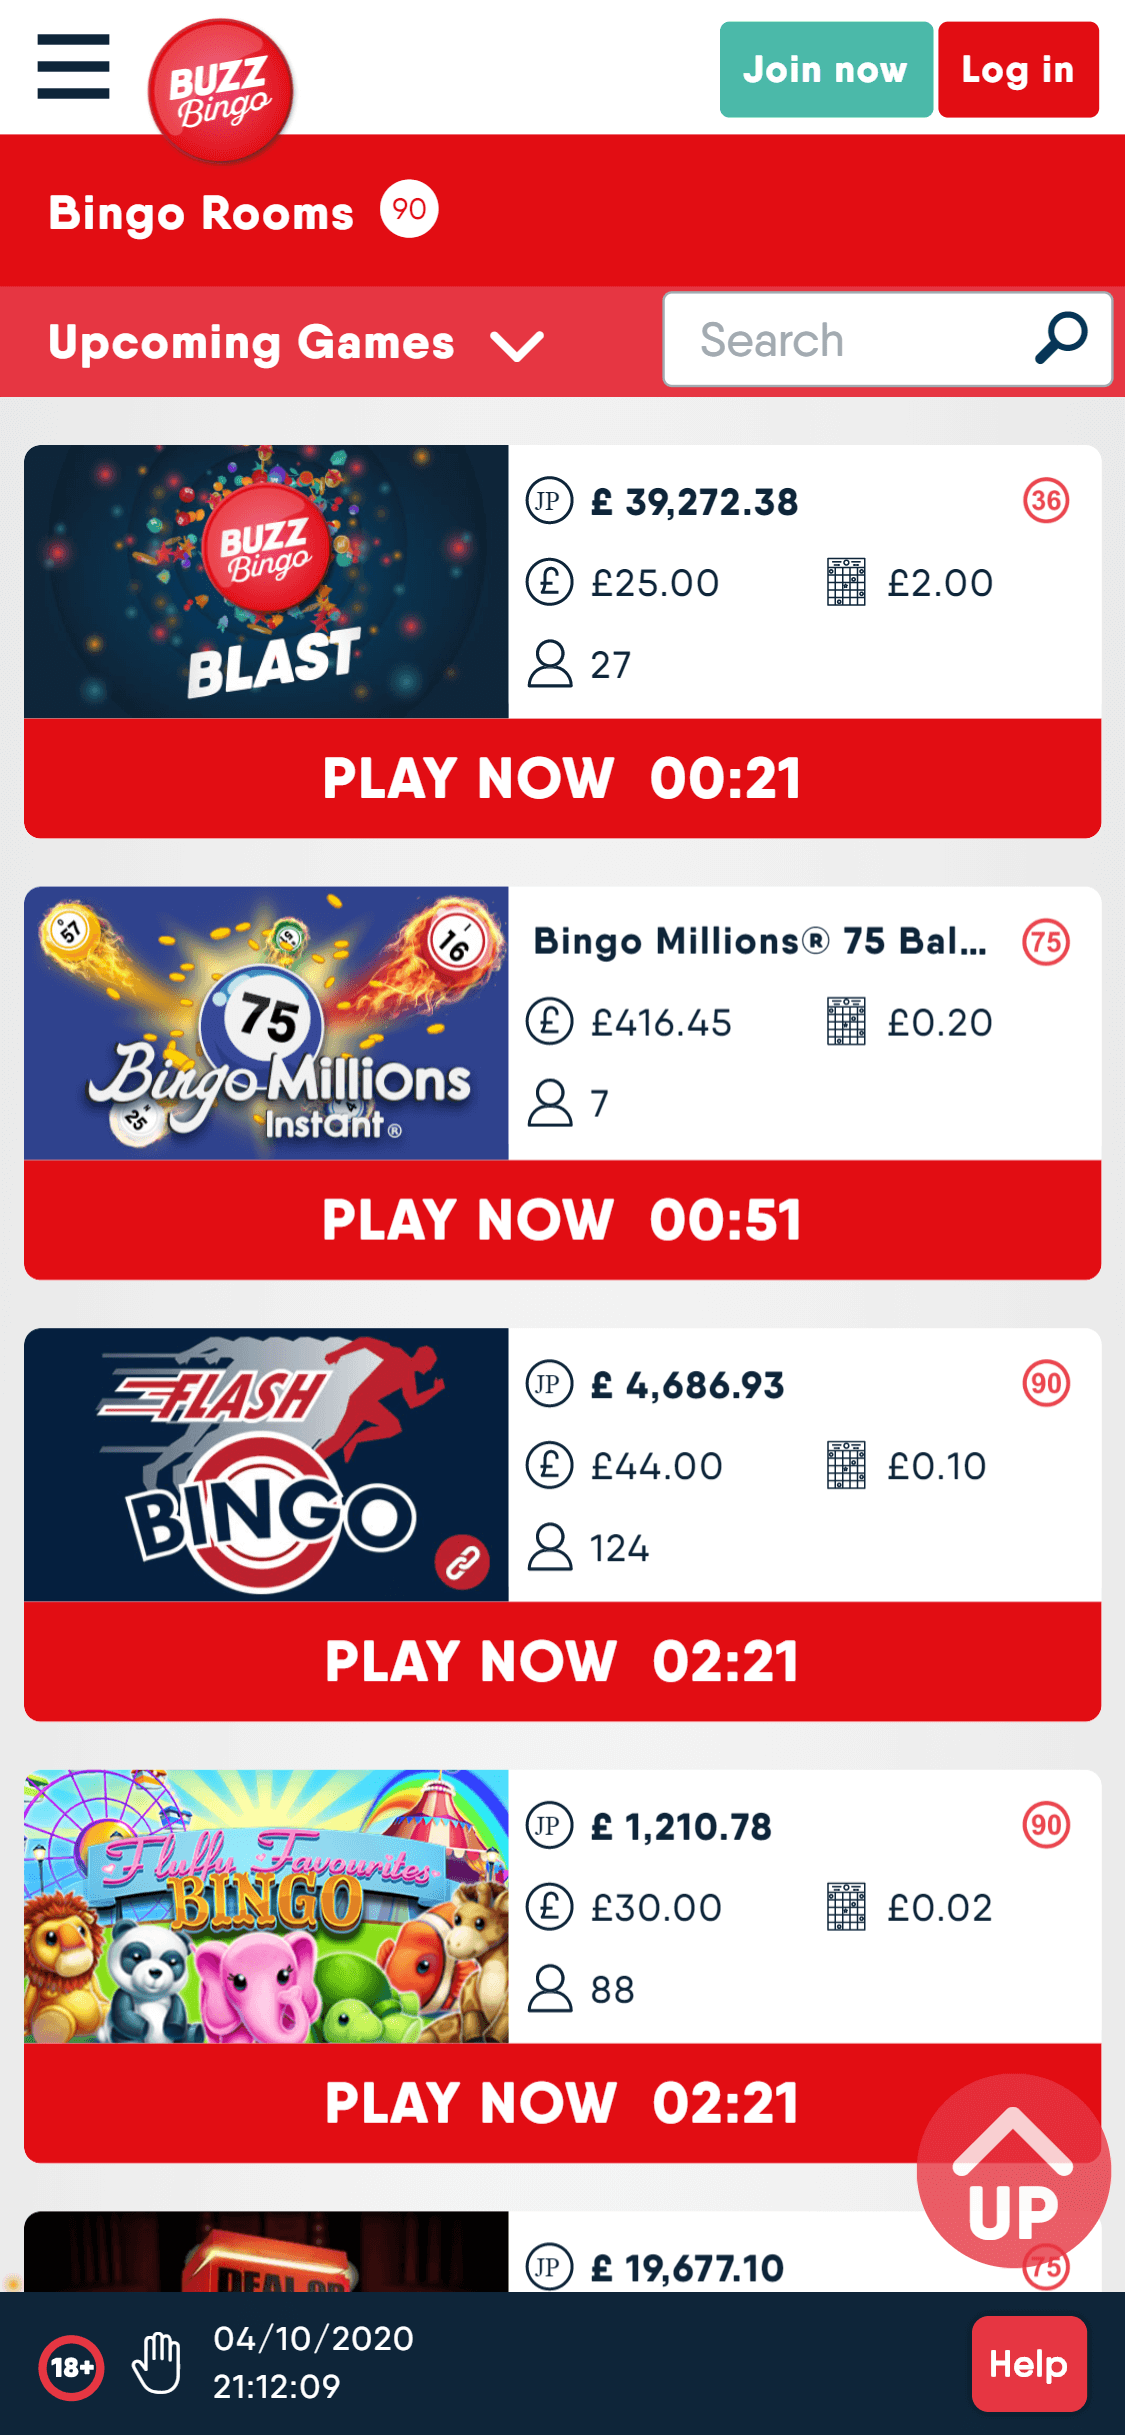 buzz bingo online bingo games screenshot